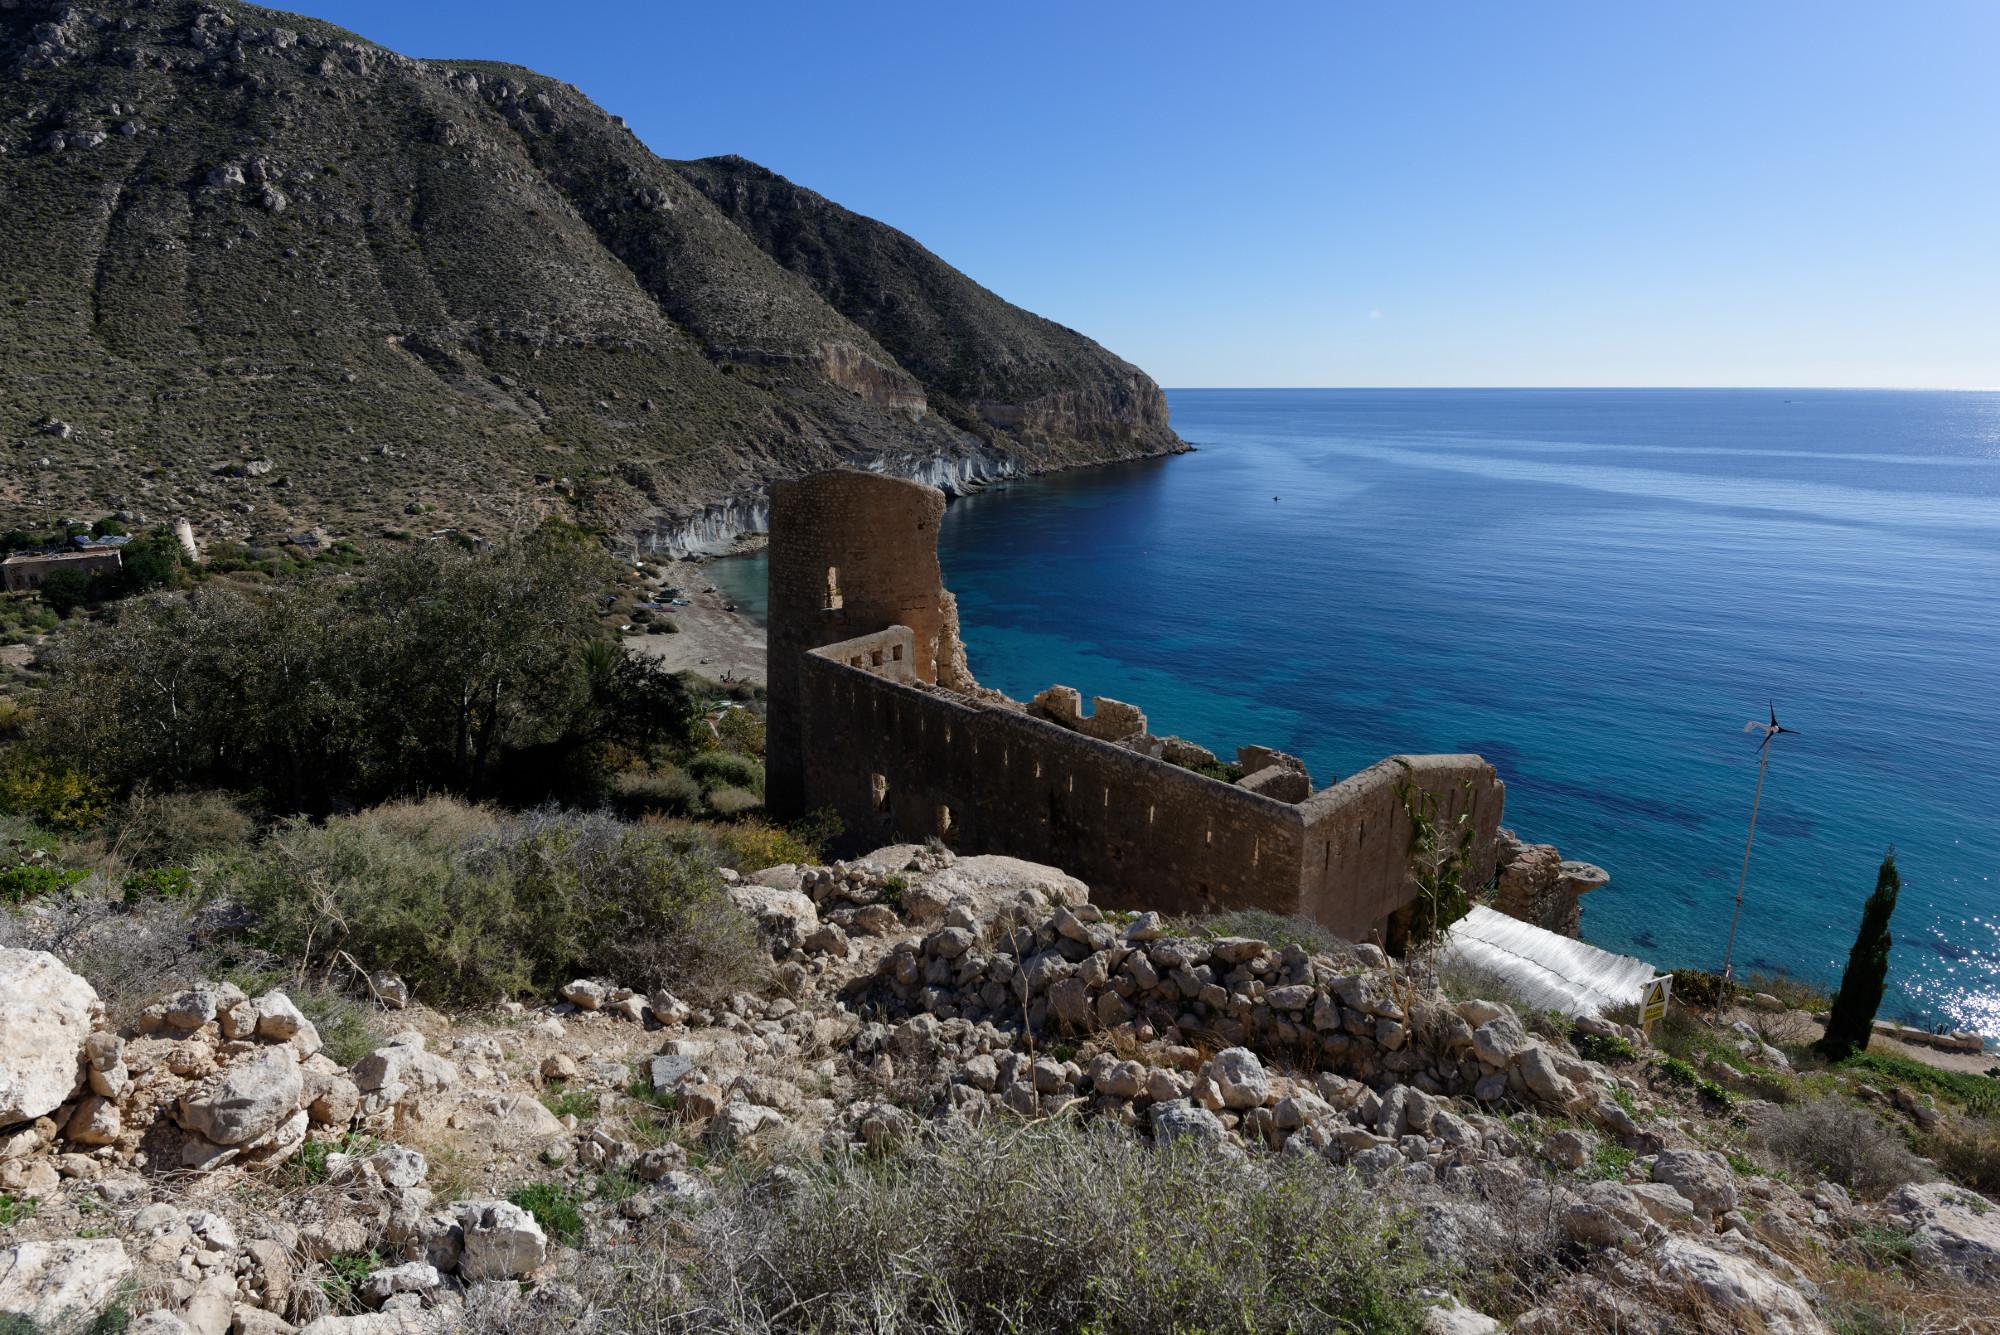 171213-Marche Las Negras-Cala San Pedro-Las Negras (43) (Cabo de Gata-Andalousie)